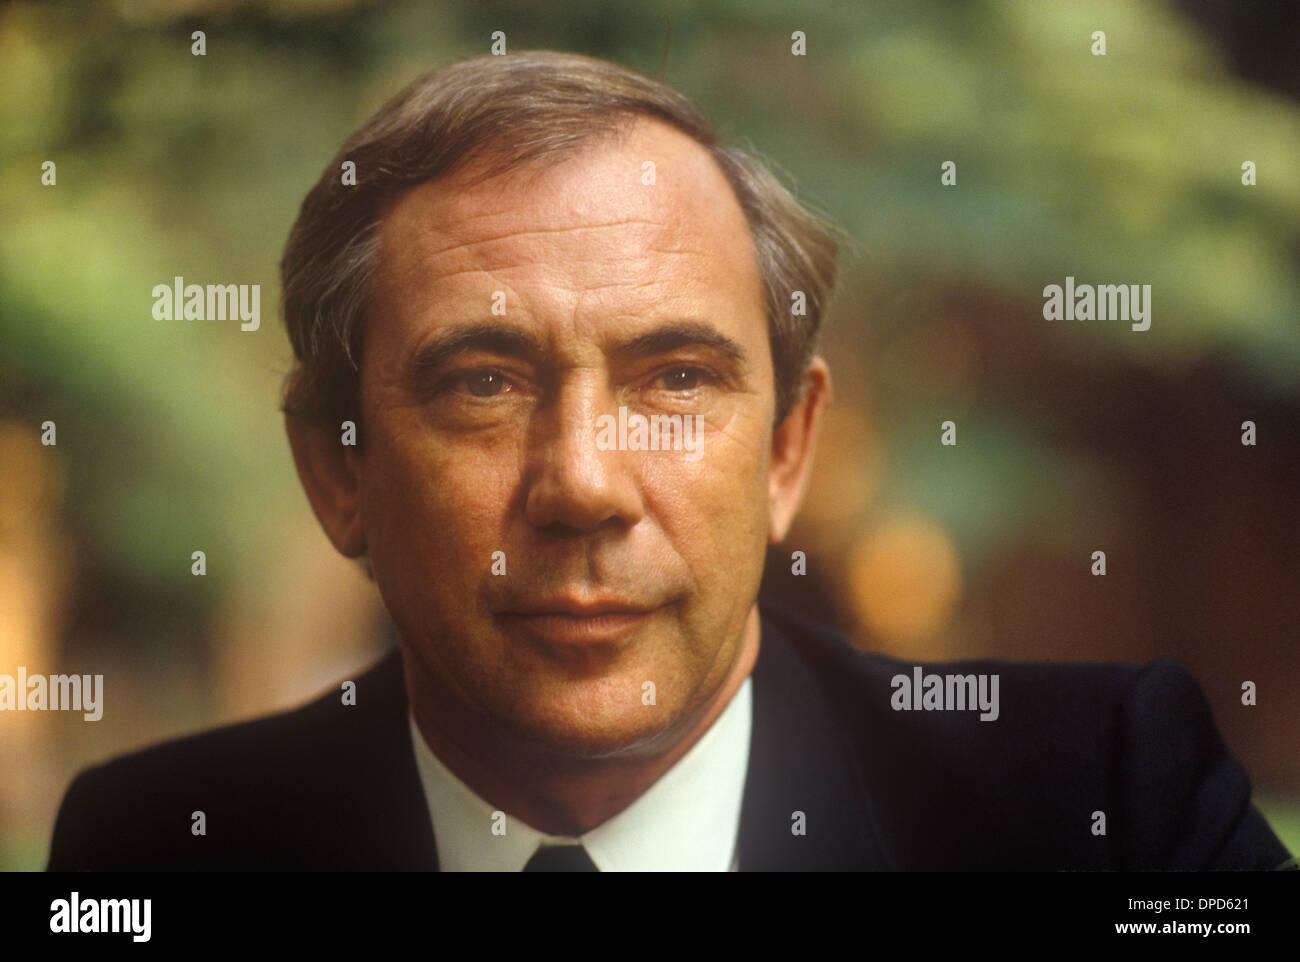 Patrick Walker astrologer 1980s 80s HOMER SYKES - Stock Image